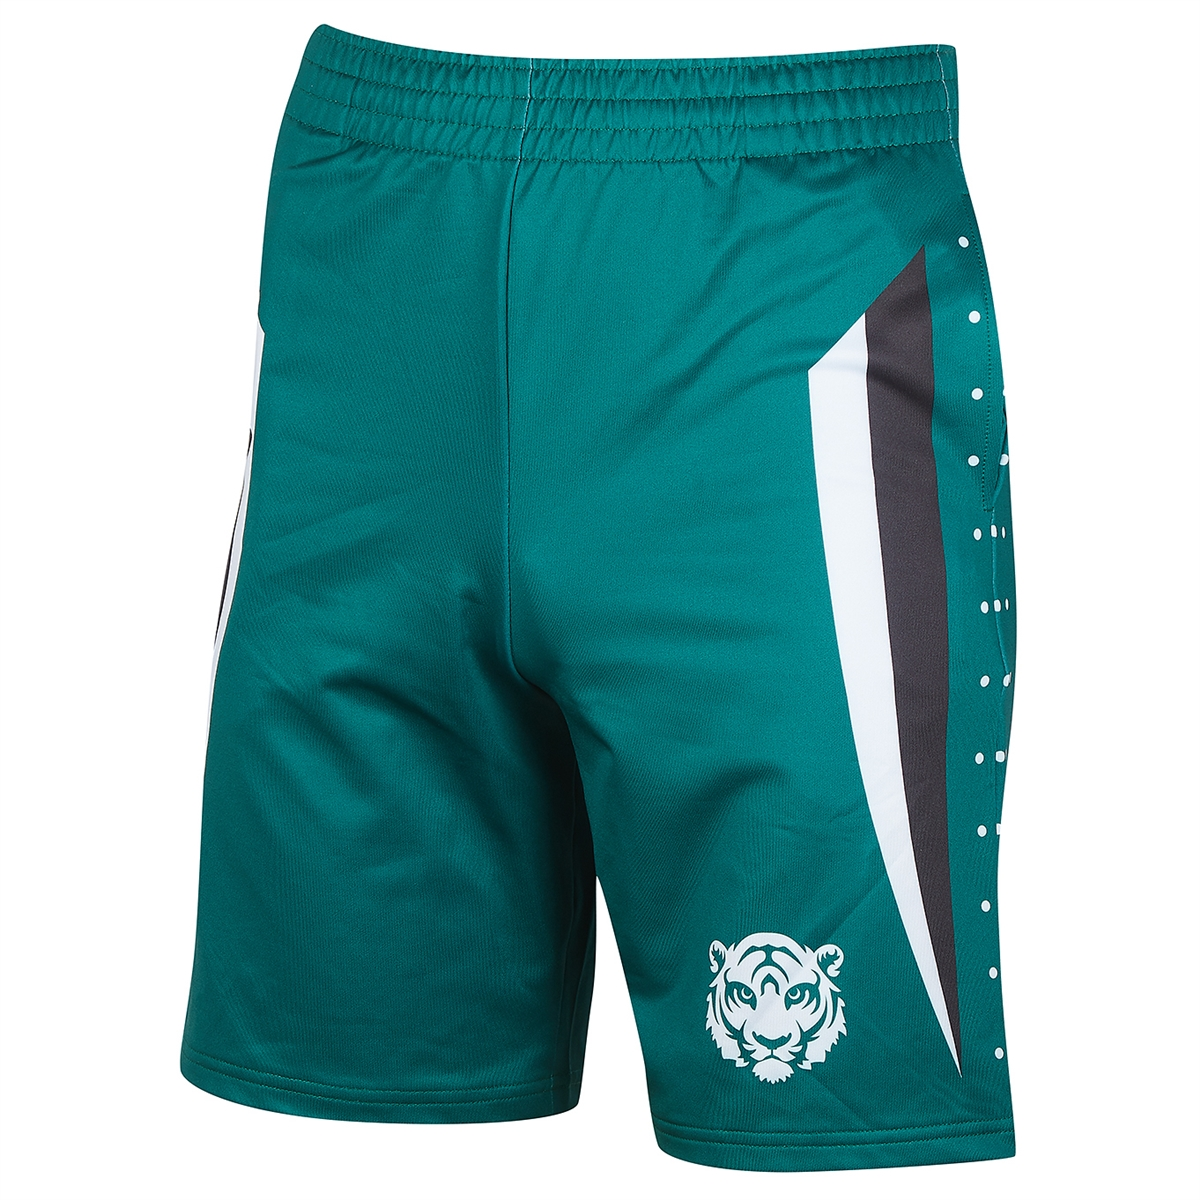 Athletic Camper Basketball Shorts